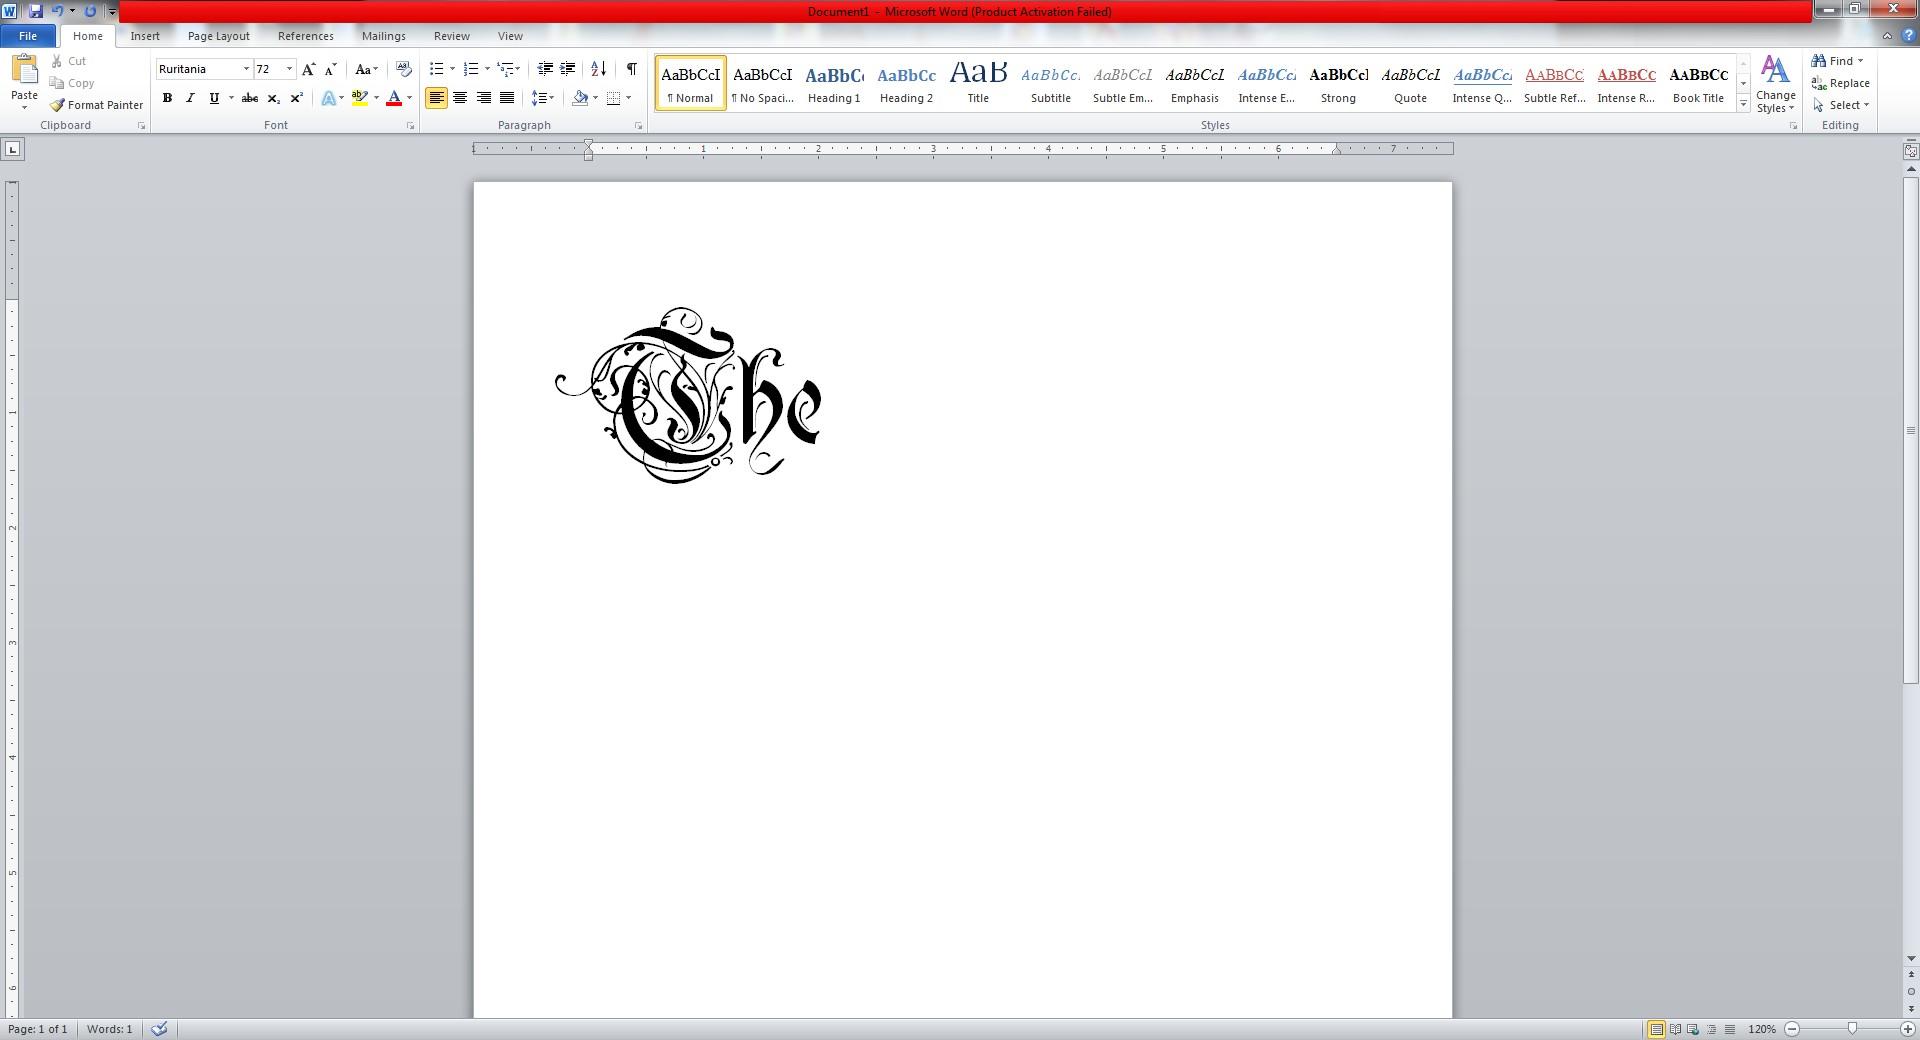 002 Hzypirh Essay Example Spongebob The Top Font Name Copy And Paste 1920